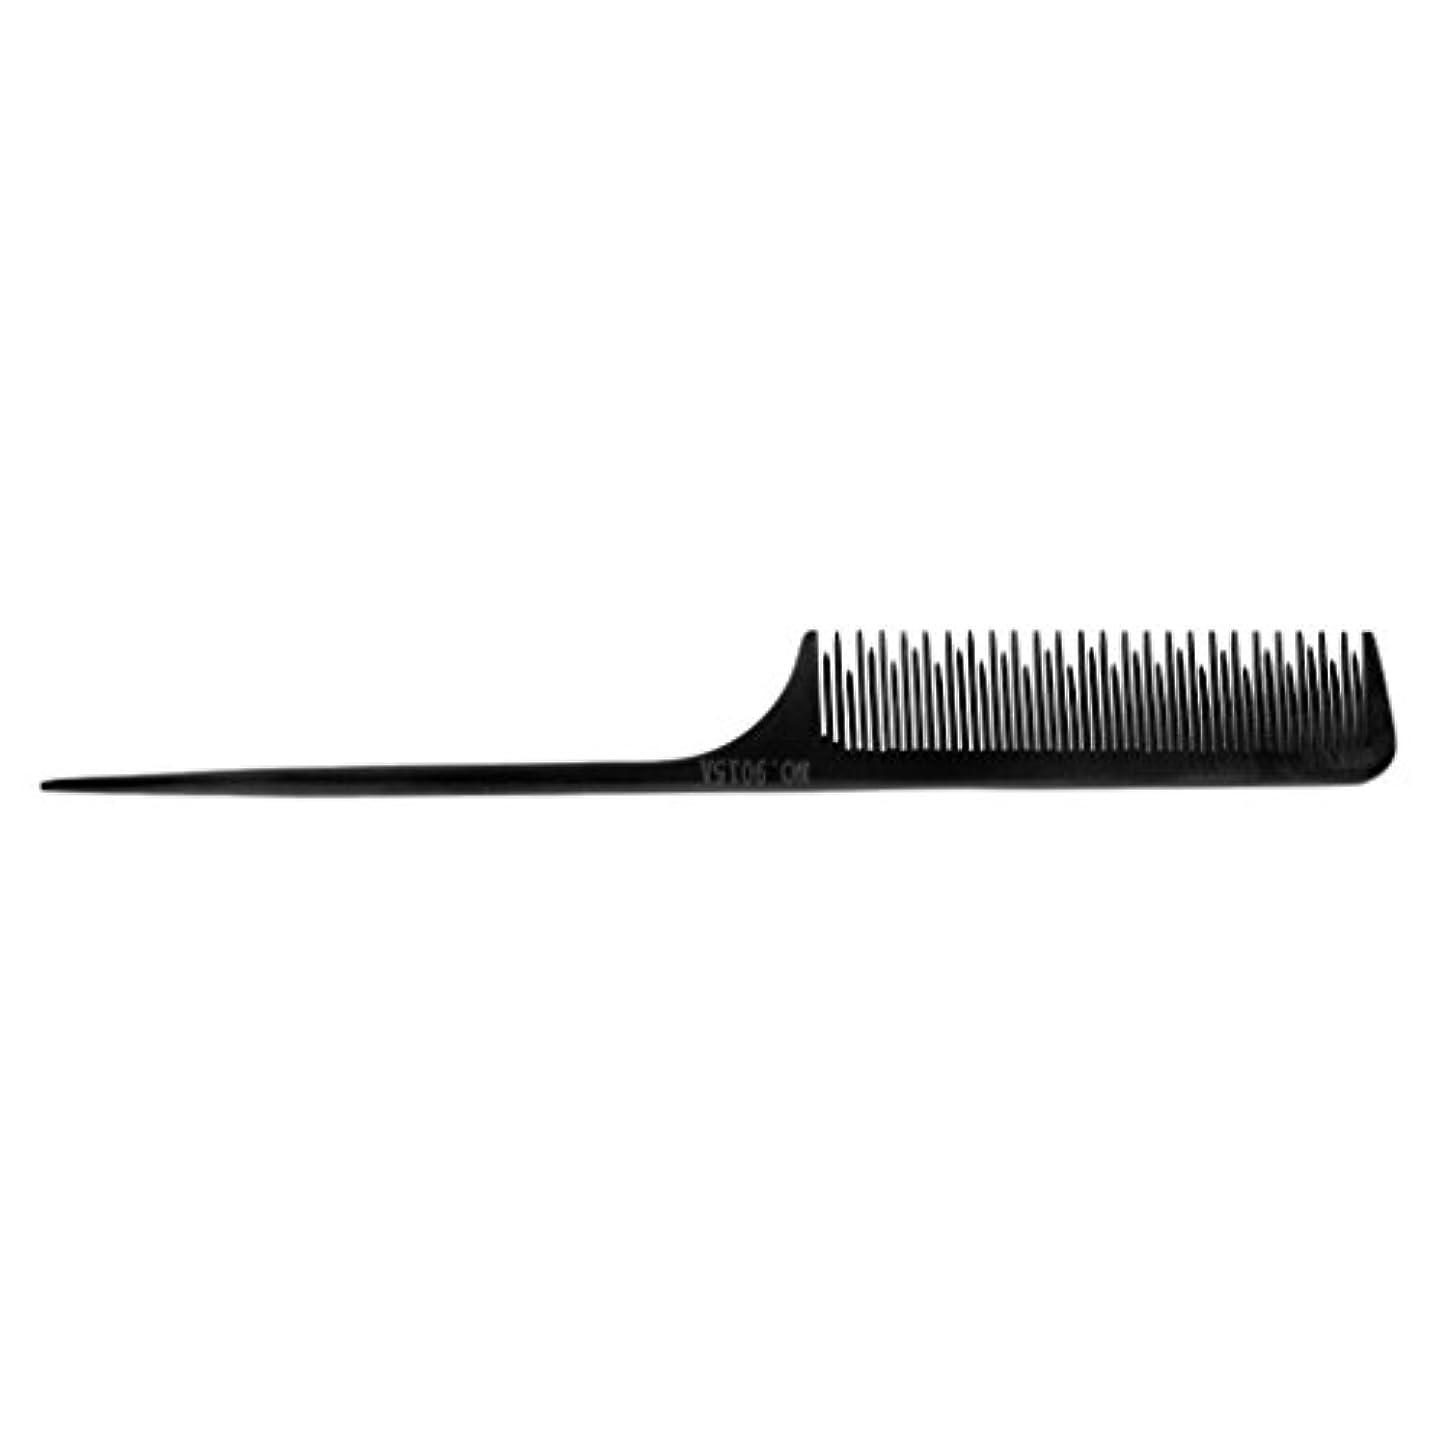 CUTICATE サロンの理髪師のテールチップスタイリングツール細かい歯の選択毛の櫛